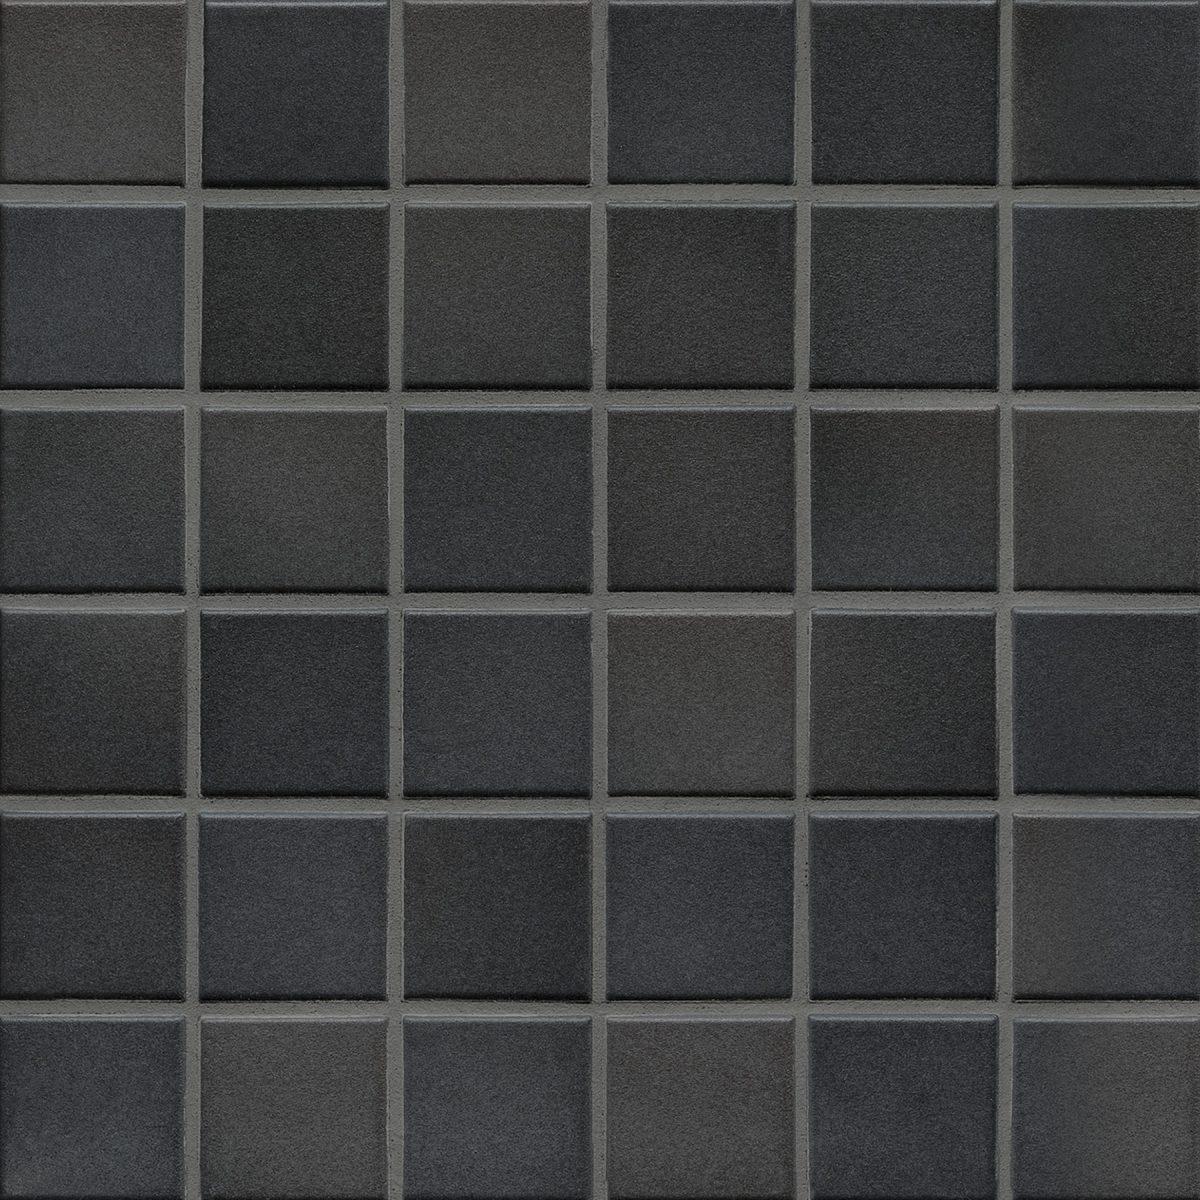 Мозаика серия Fresh 5,0 X 5,0 см Midnight Black Mix Secura (противоскользящая R10/B)